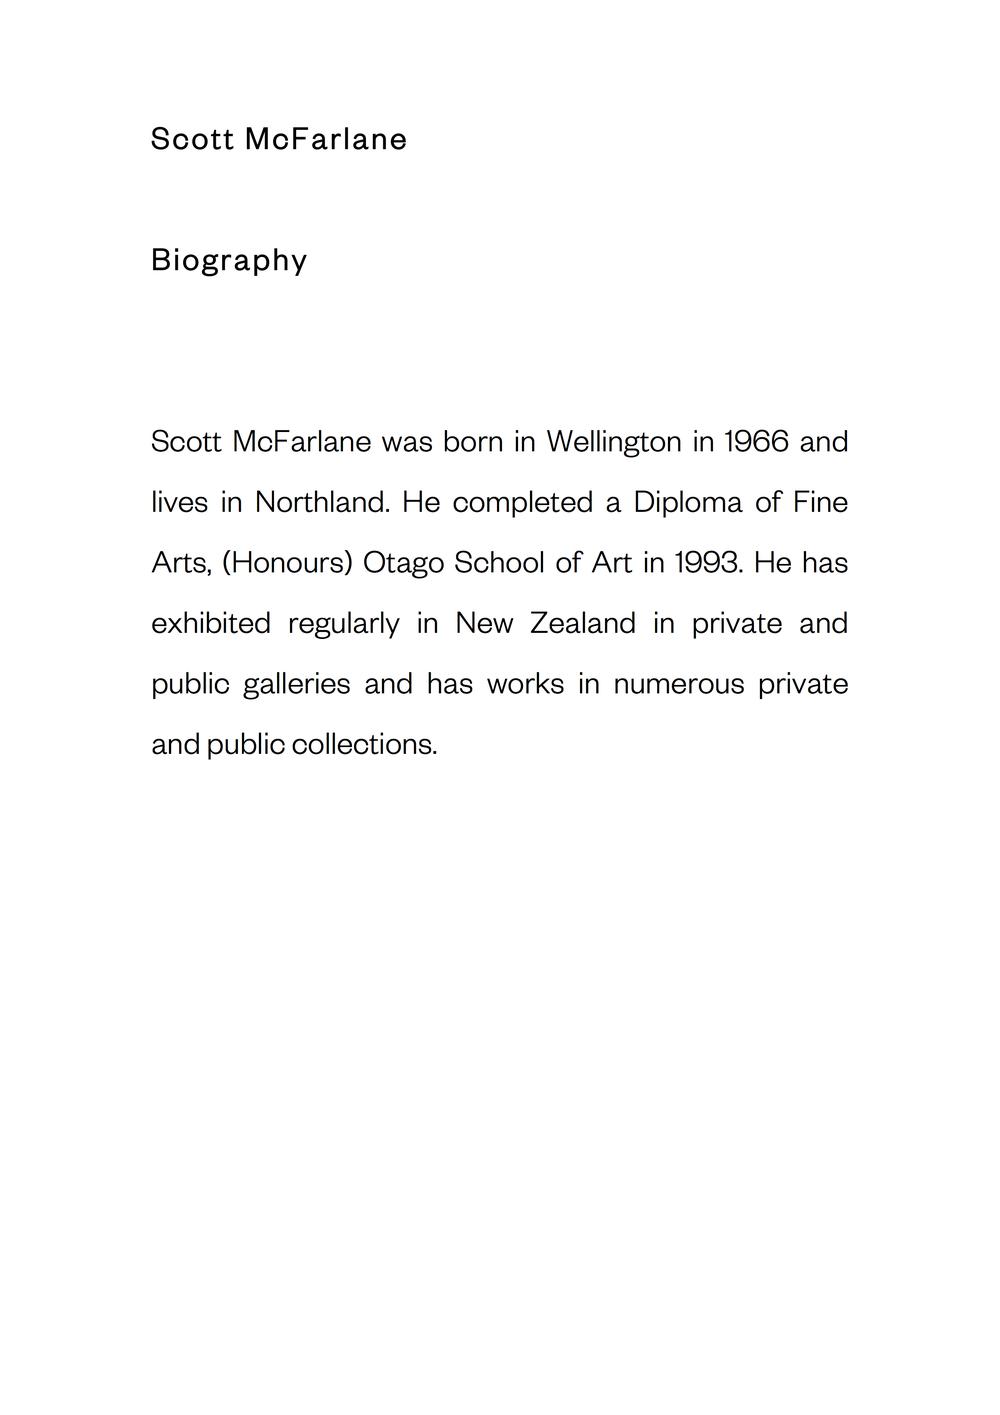 Scott McFarlane - Bio.jpg